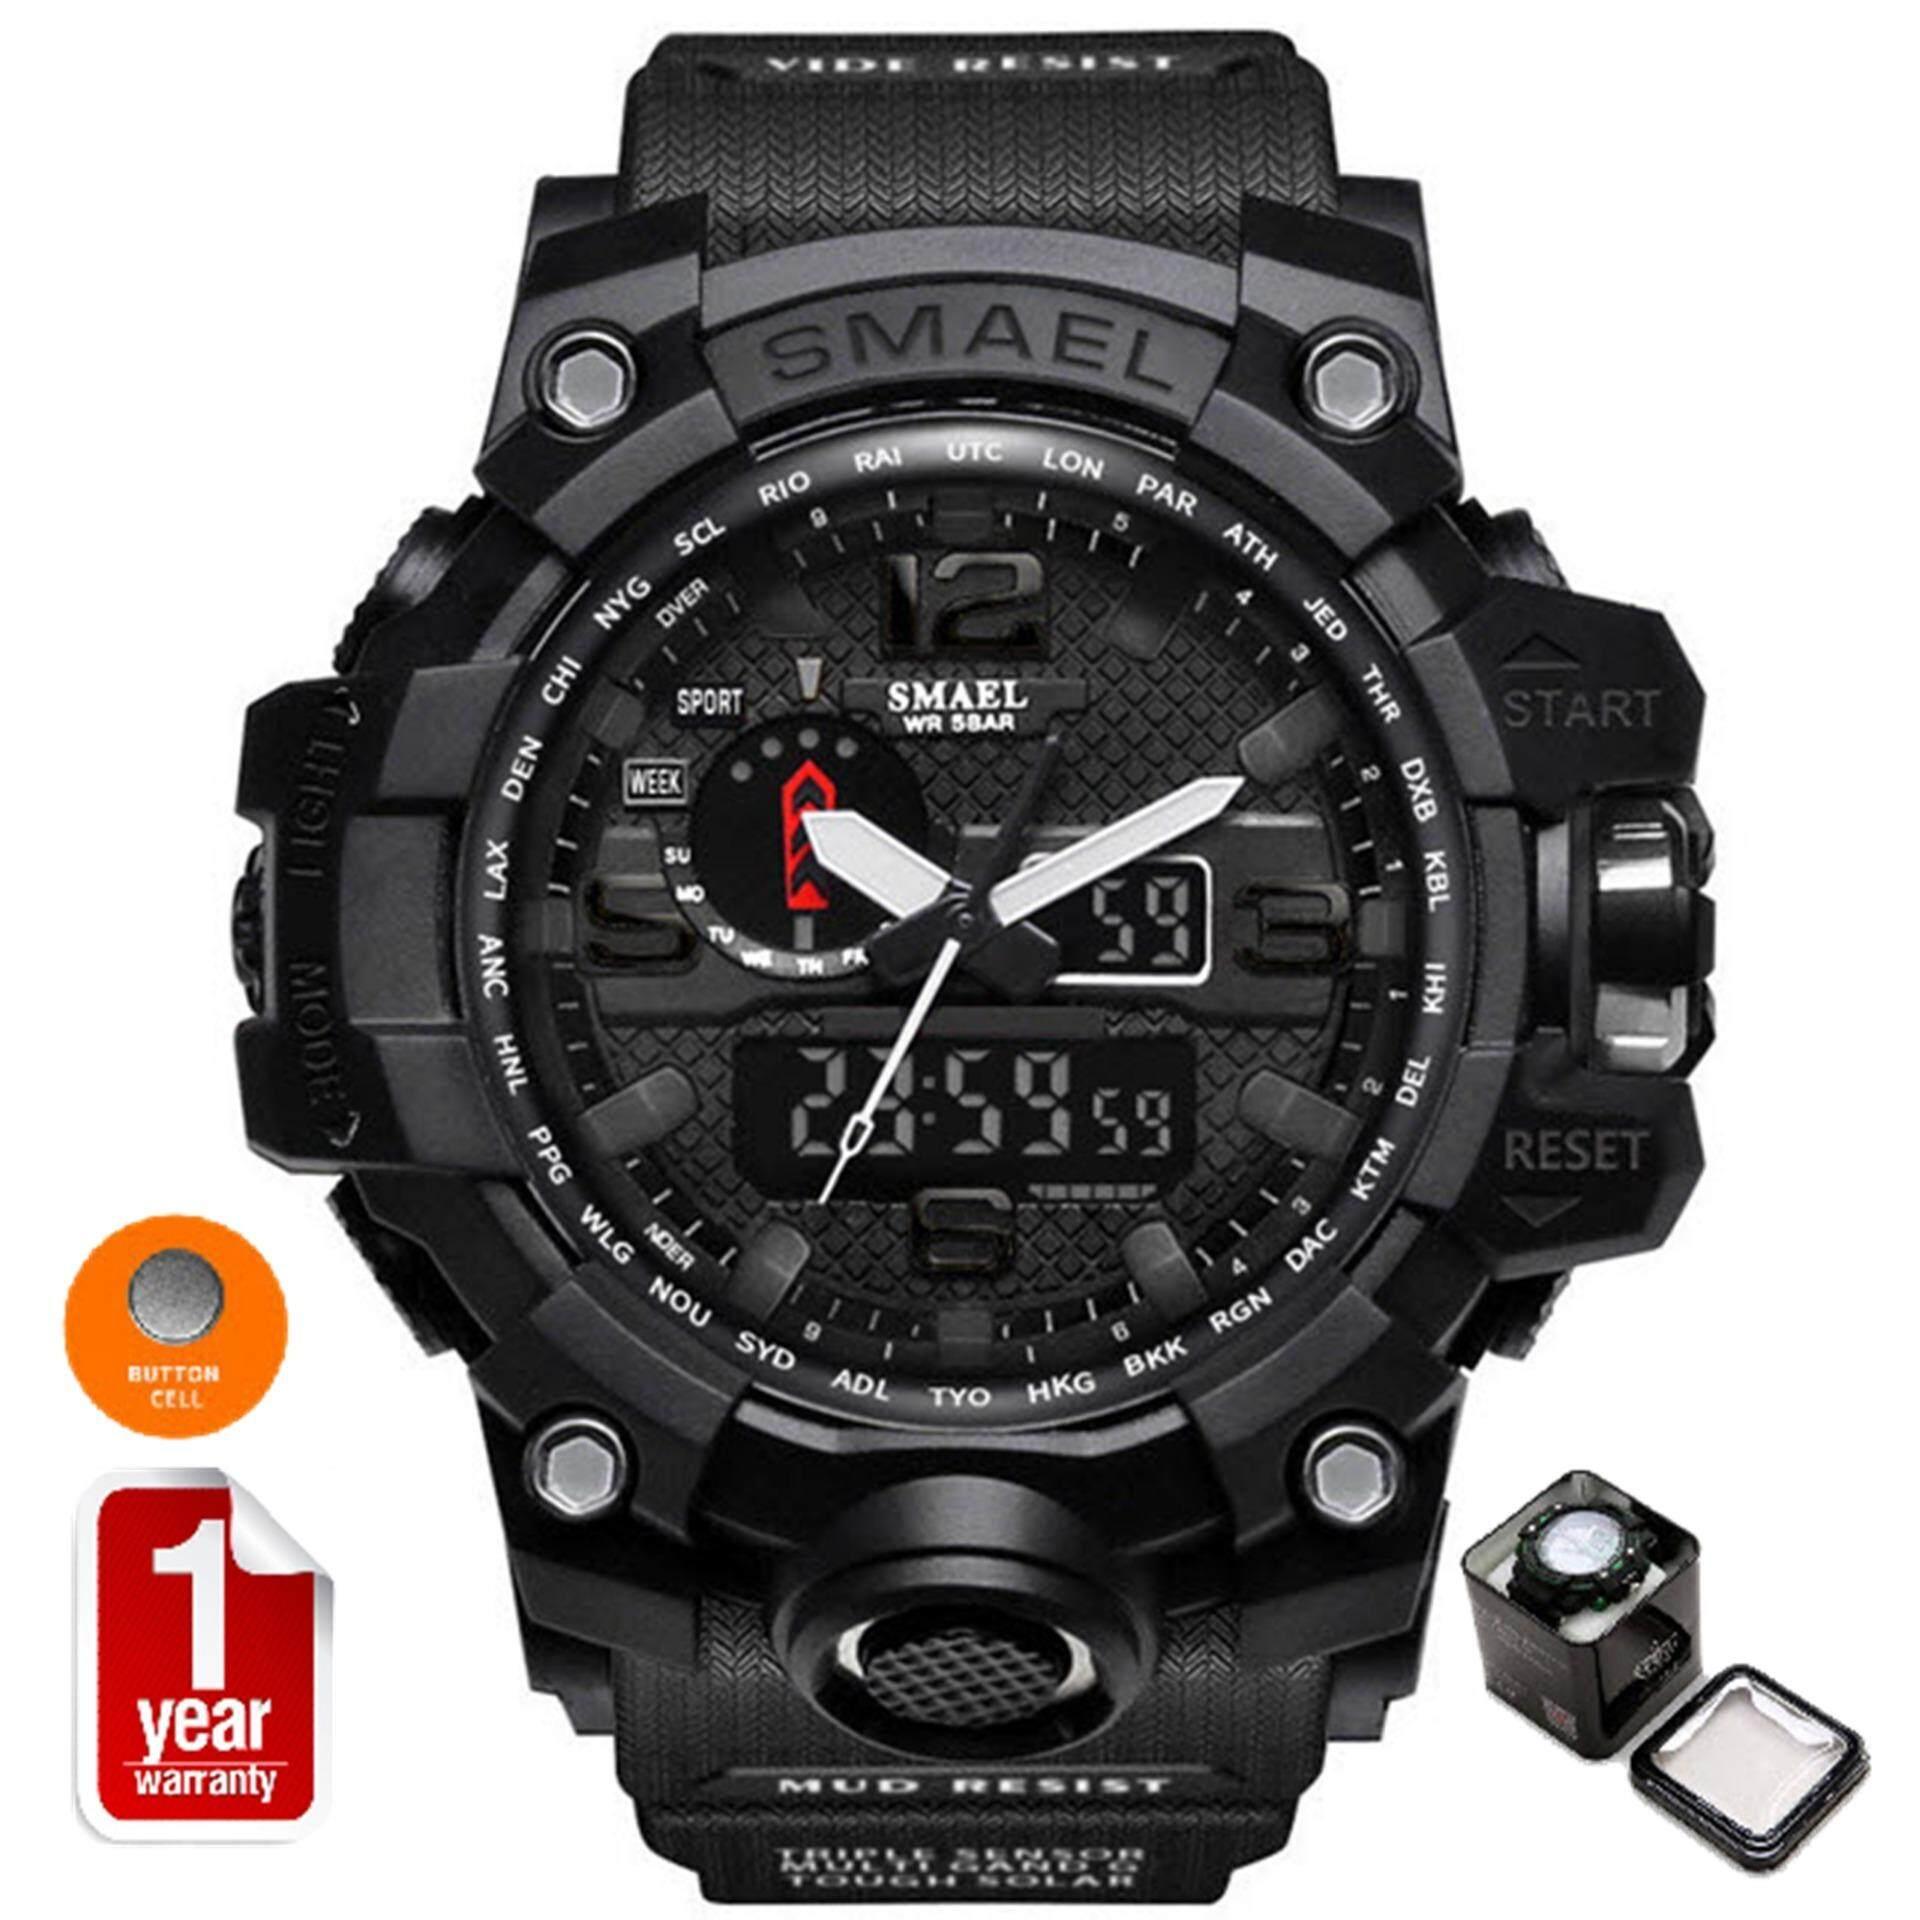 Smael นาฬิกาข้อมือผู้ชาย Sport Digital Led รุ่น Sm1545 Black เป็นต้นฉบับ